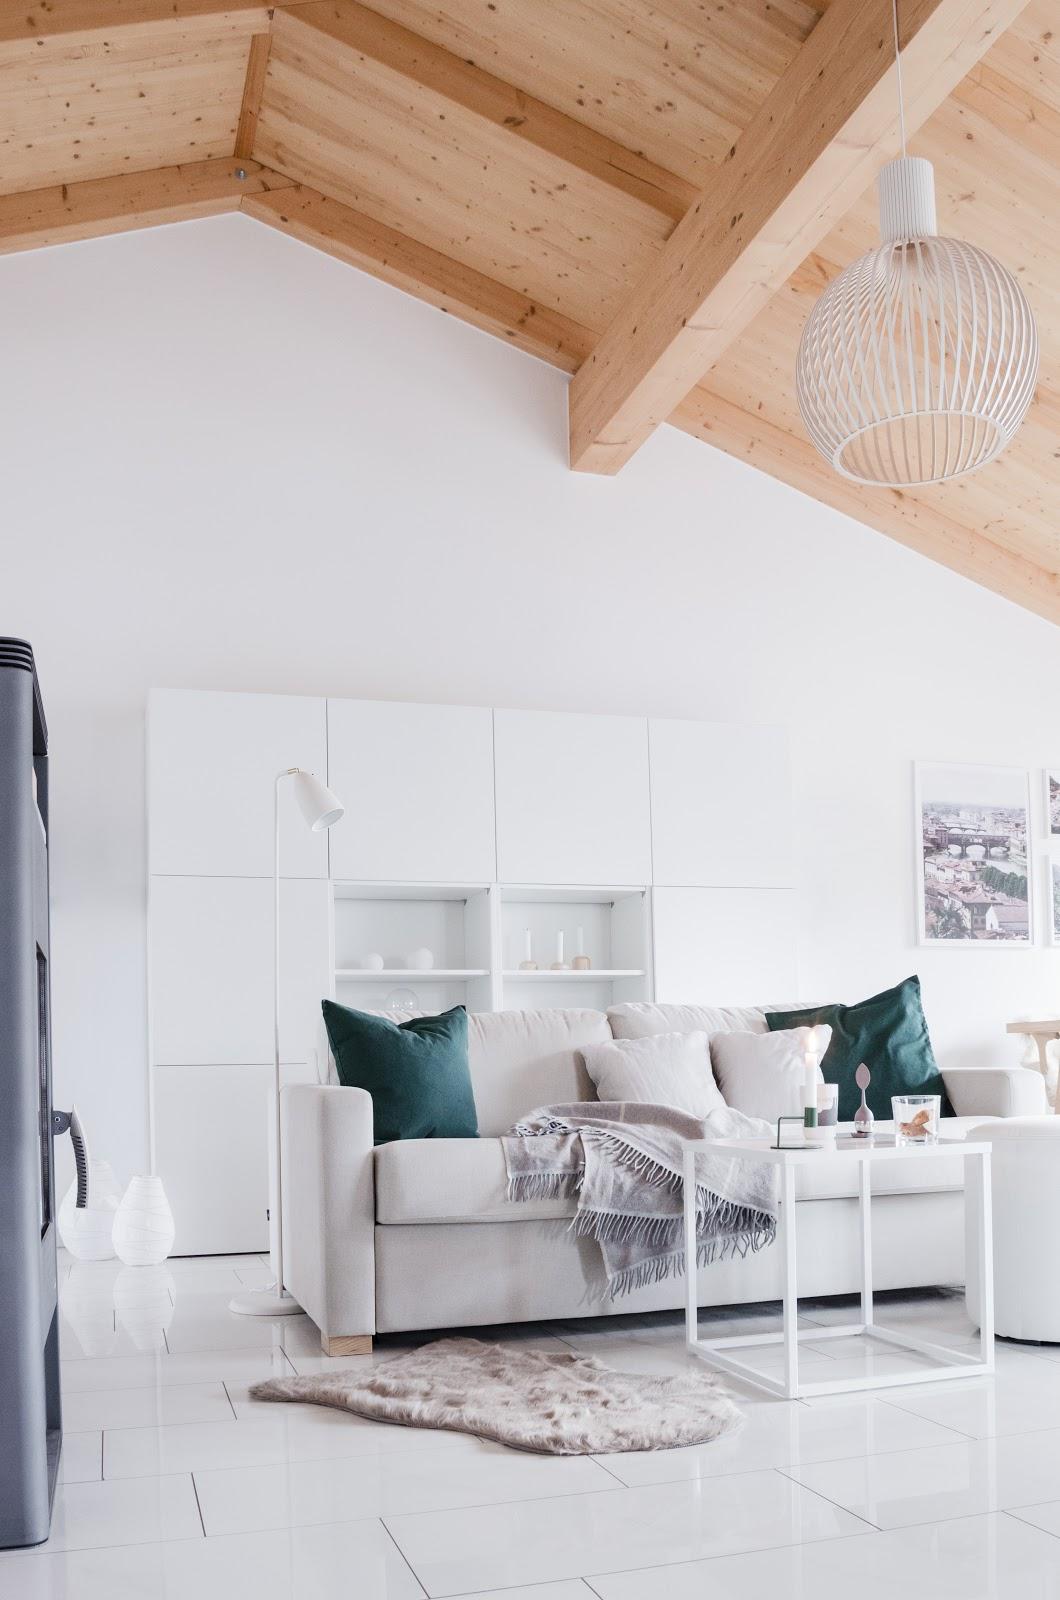 wiesoeigentlichnicht heimelig. Black Bedroom Furniture Sets. Home Design Ideas